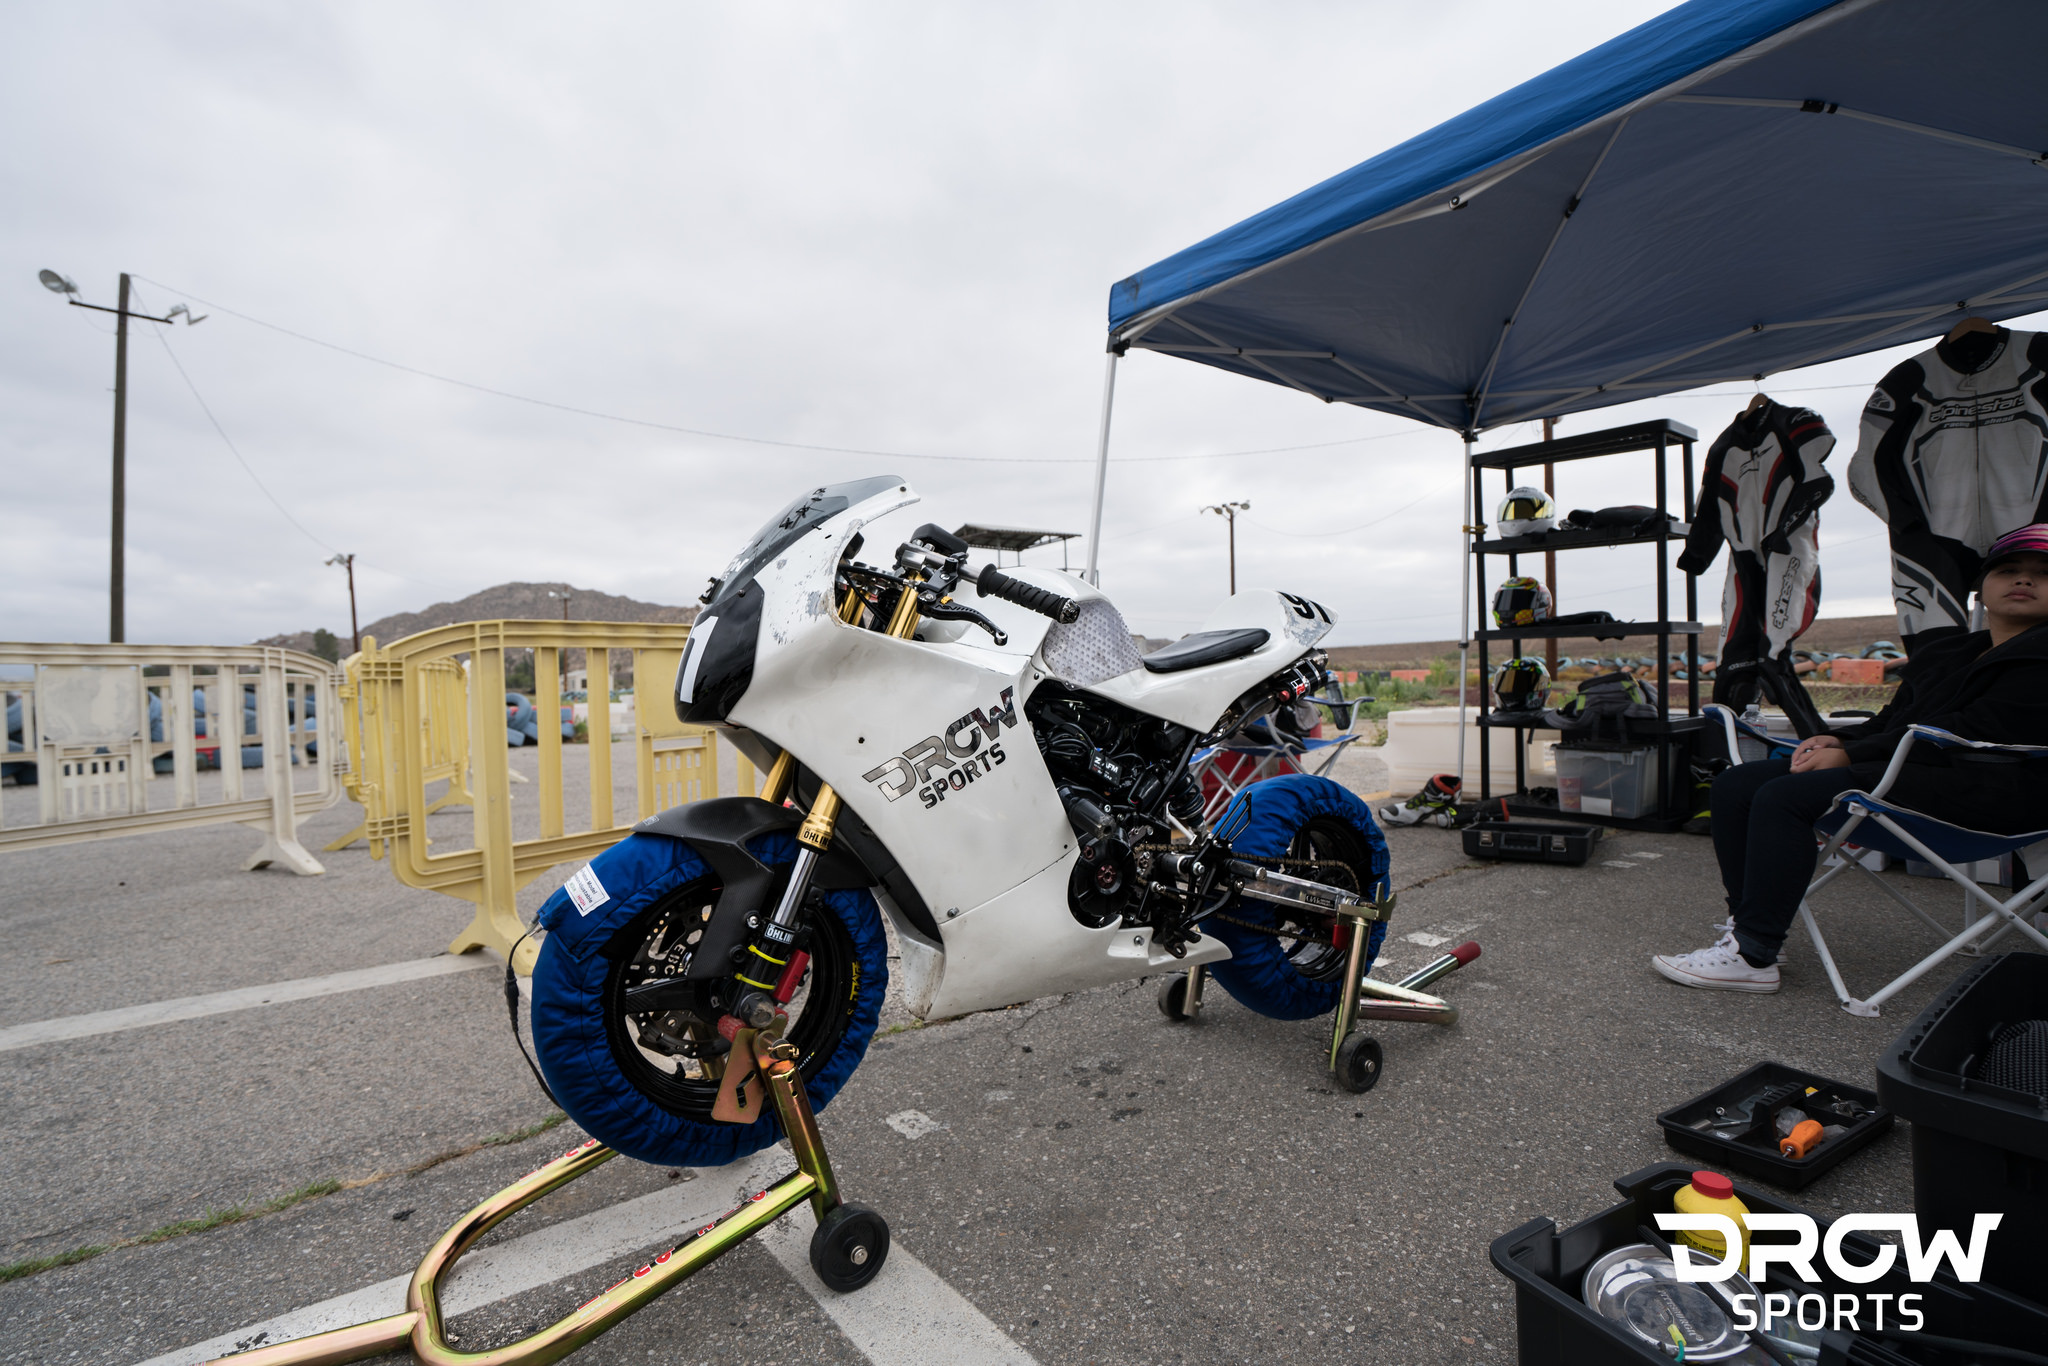 2017 Diablo Rosso Scooter tires-27354642063_ebc4123a4d_k.jpg